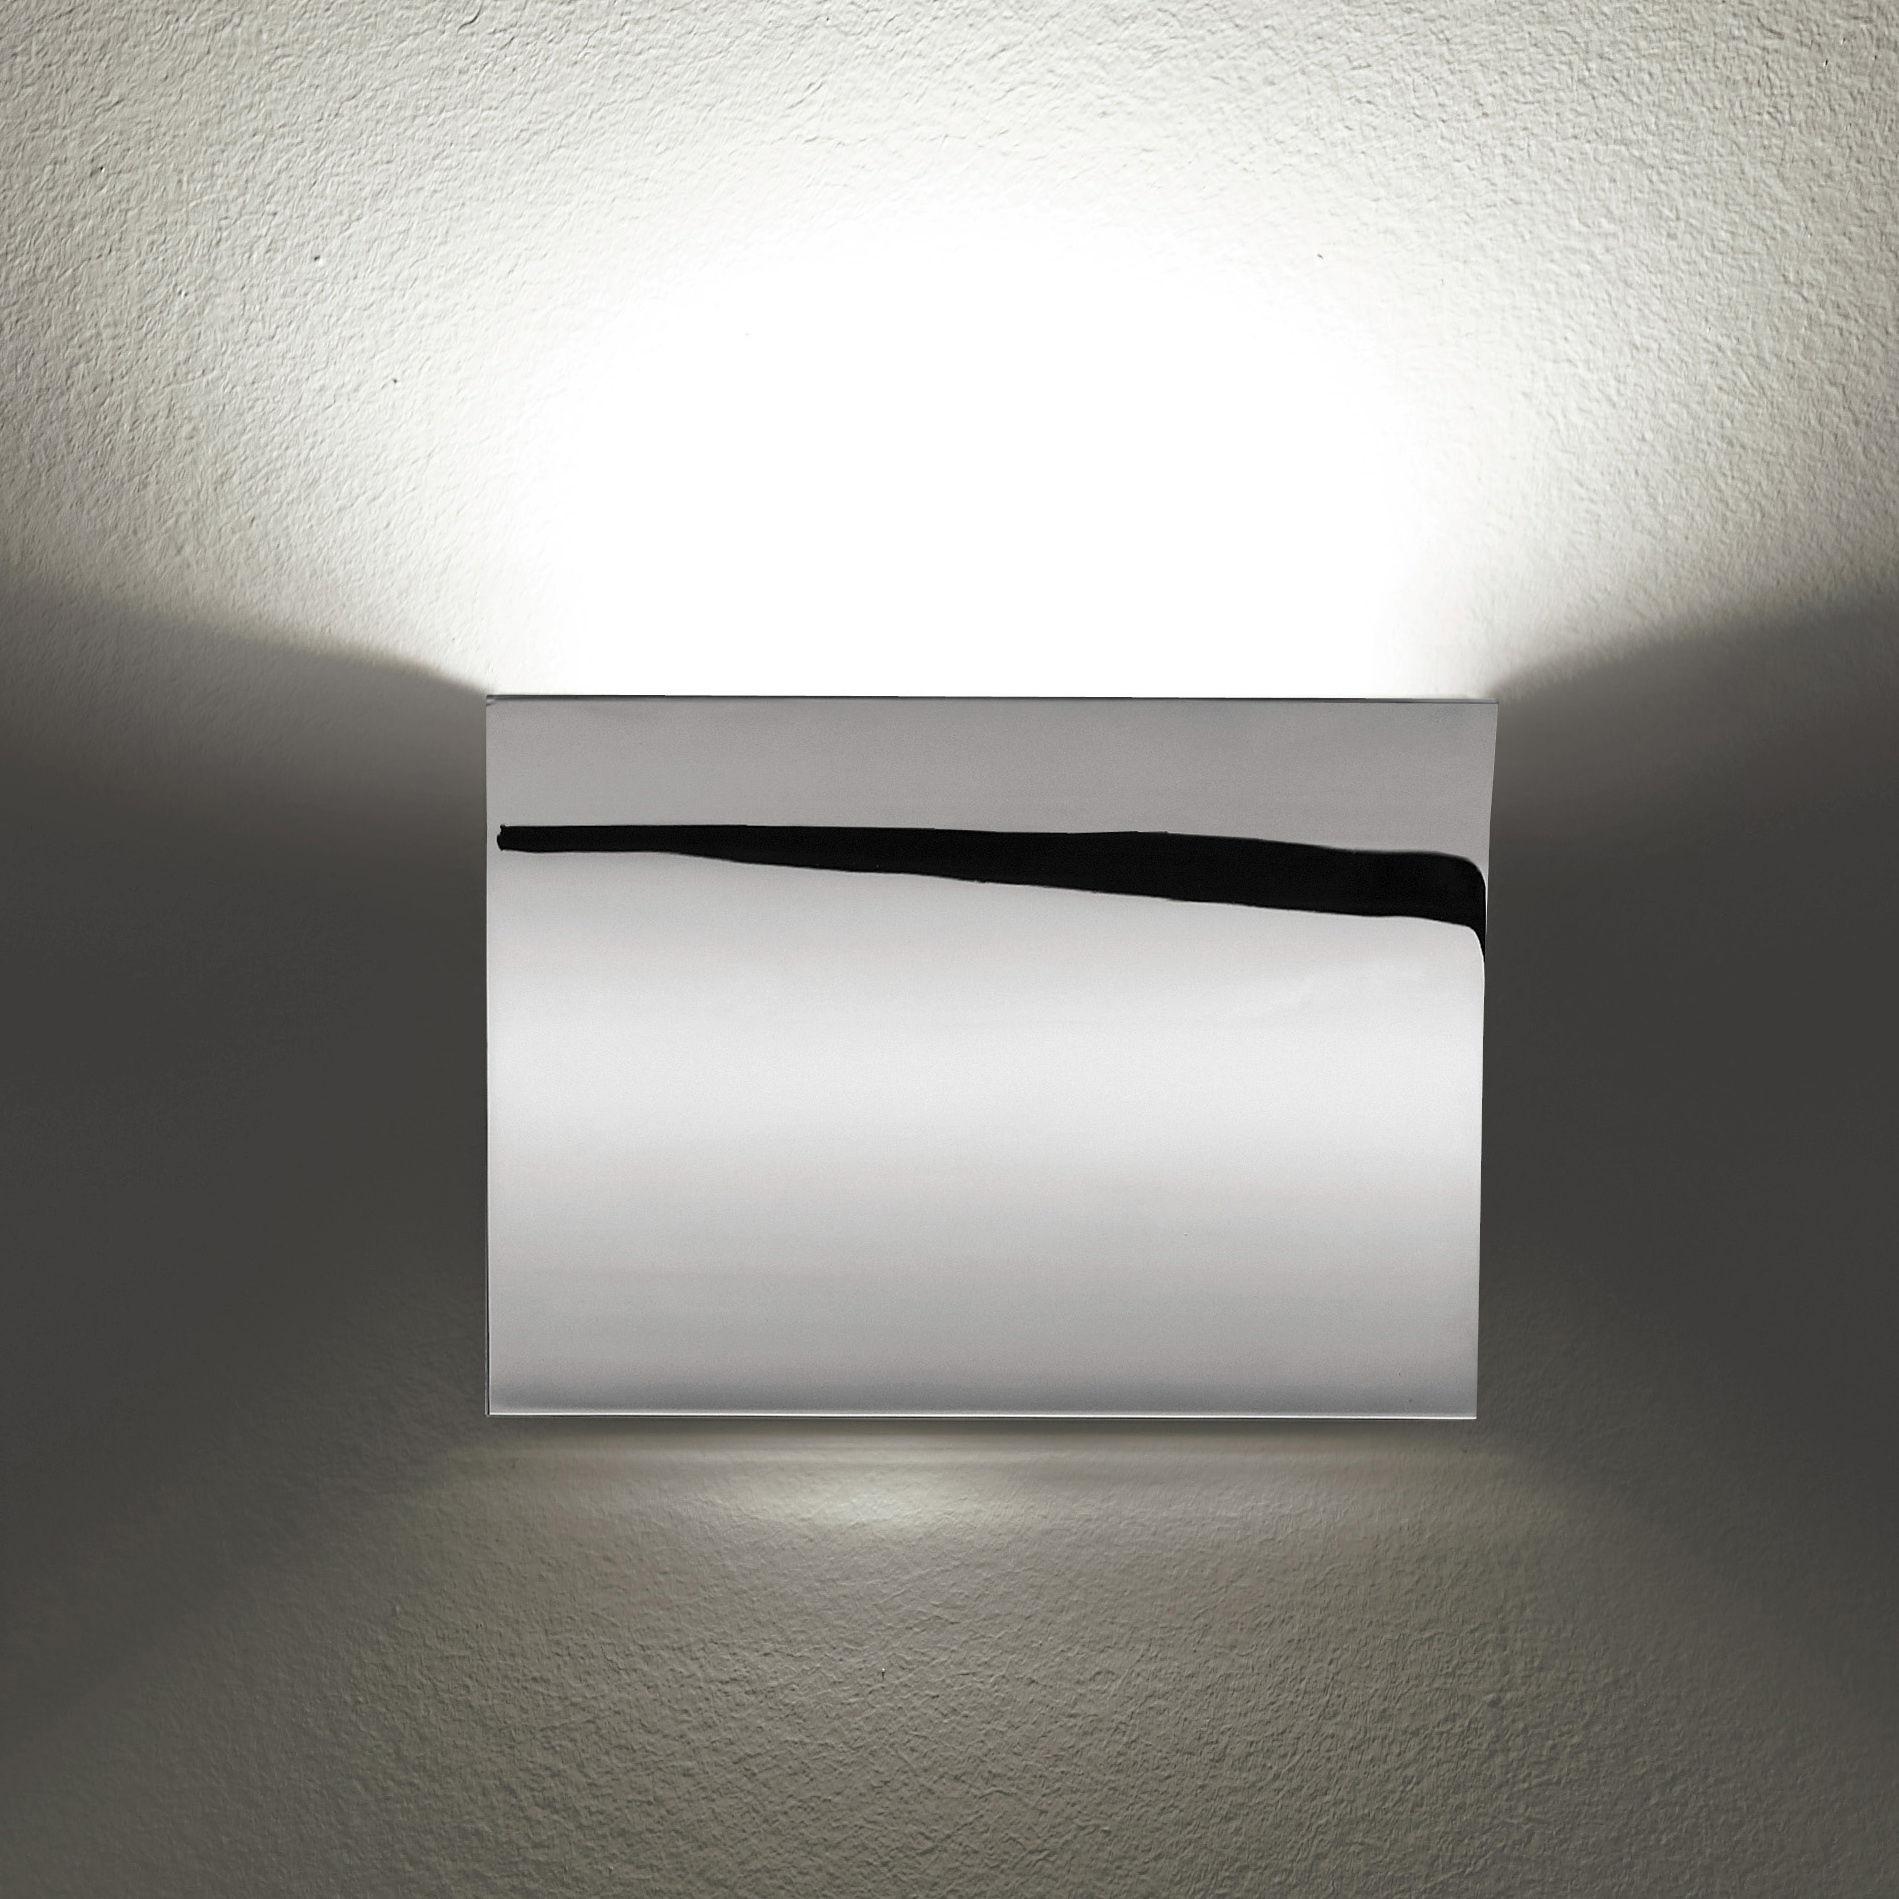 Lighting - Wall Lights - Pochette Wall light by Flos - Chrome - Zamak